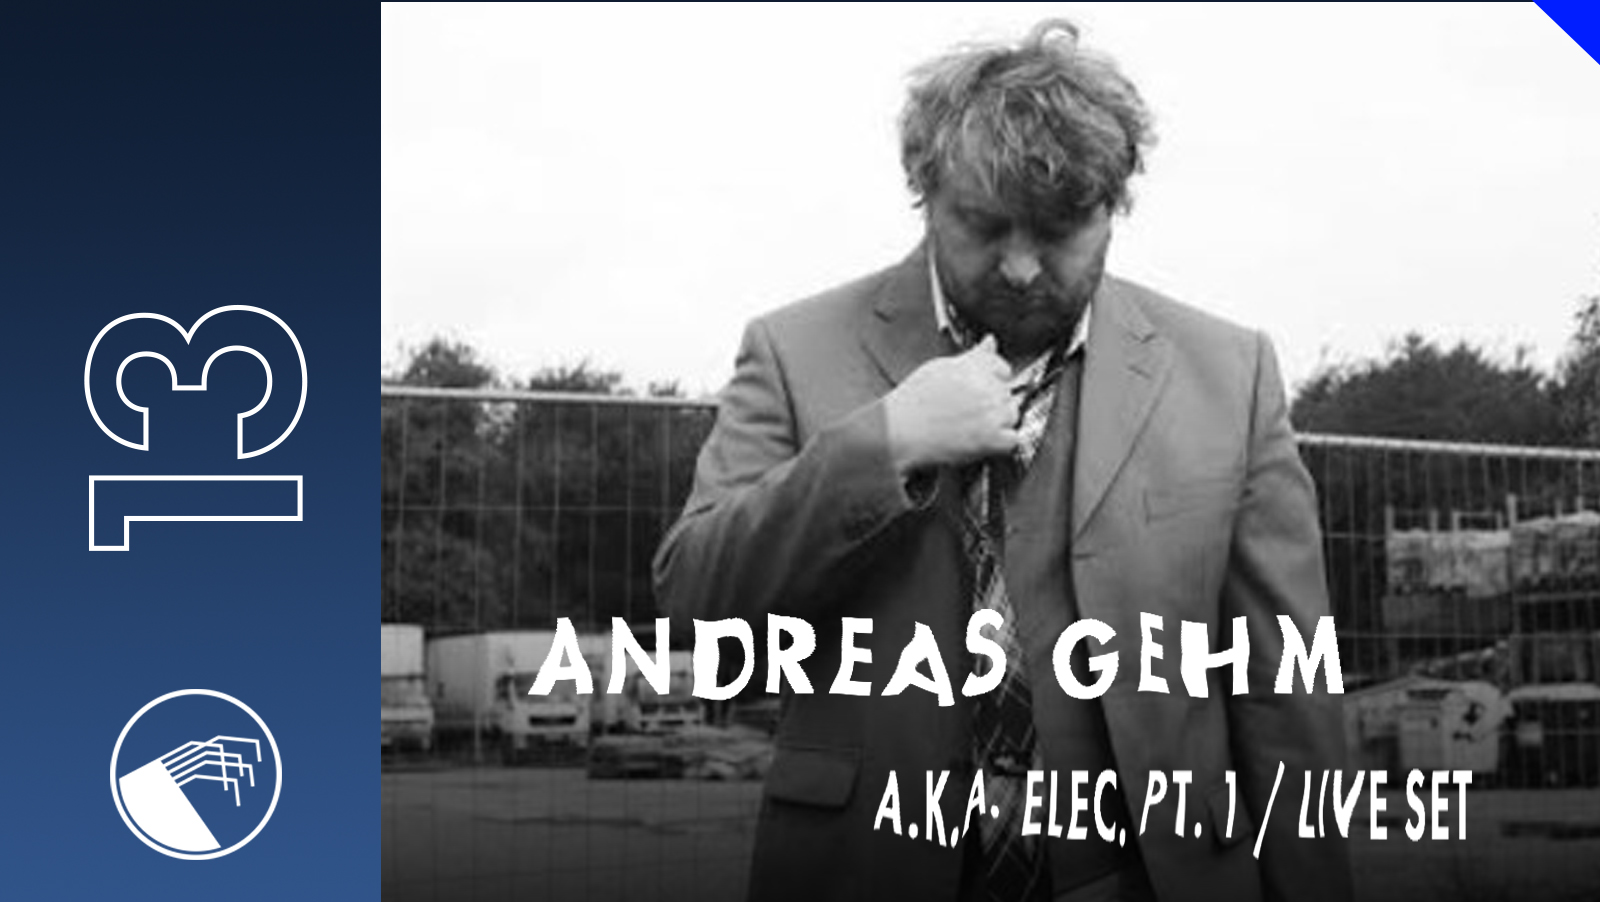 013 Andreas Gehm aka Elec Pt.1 LIVE